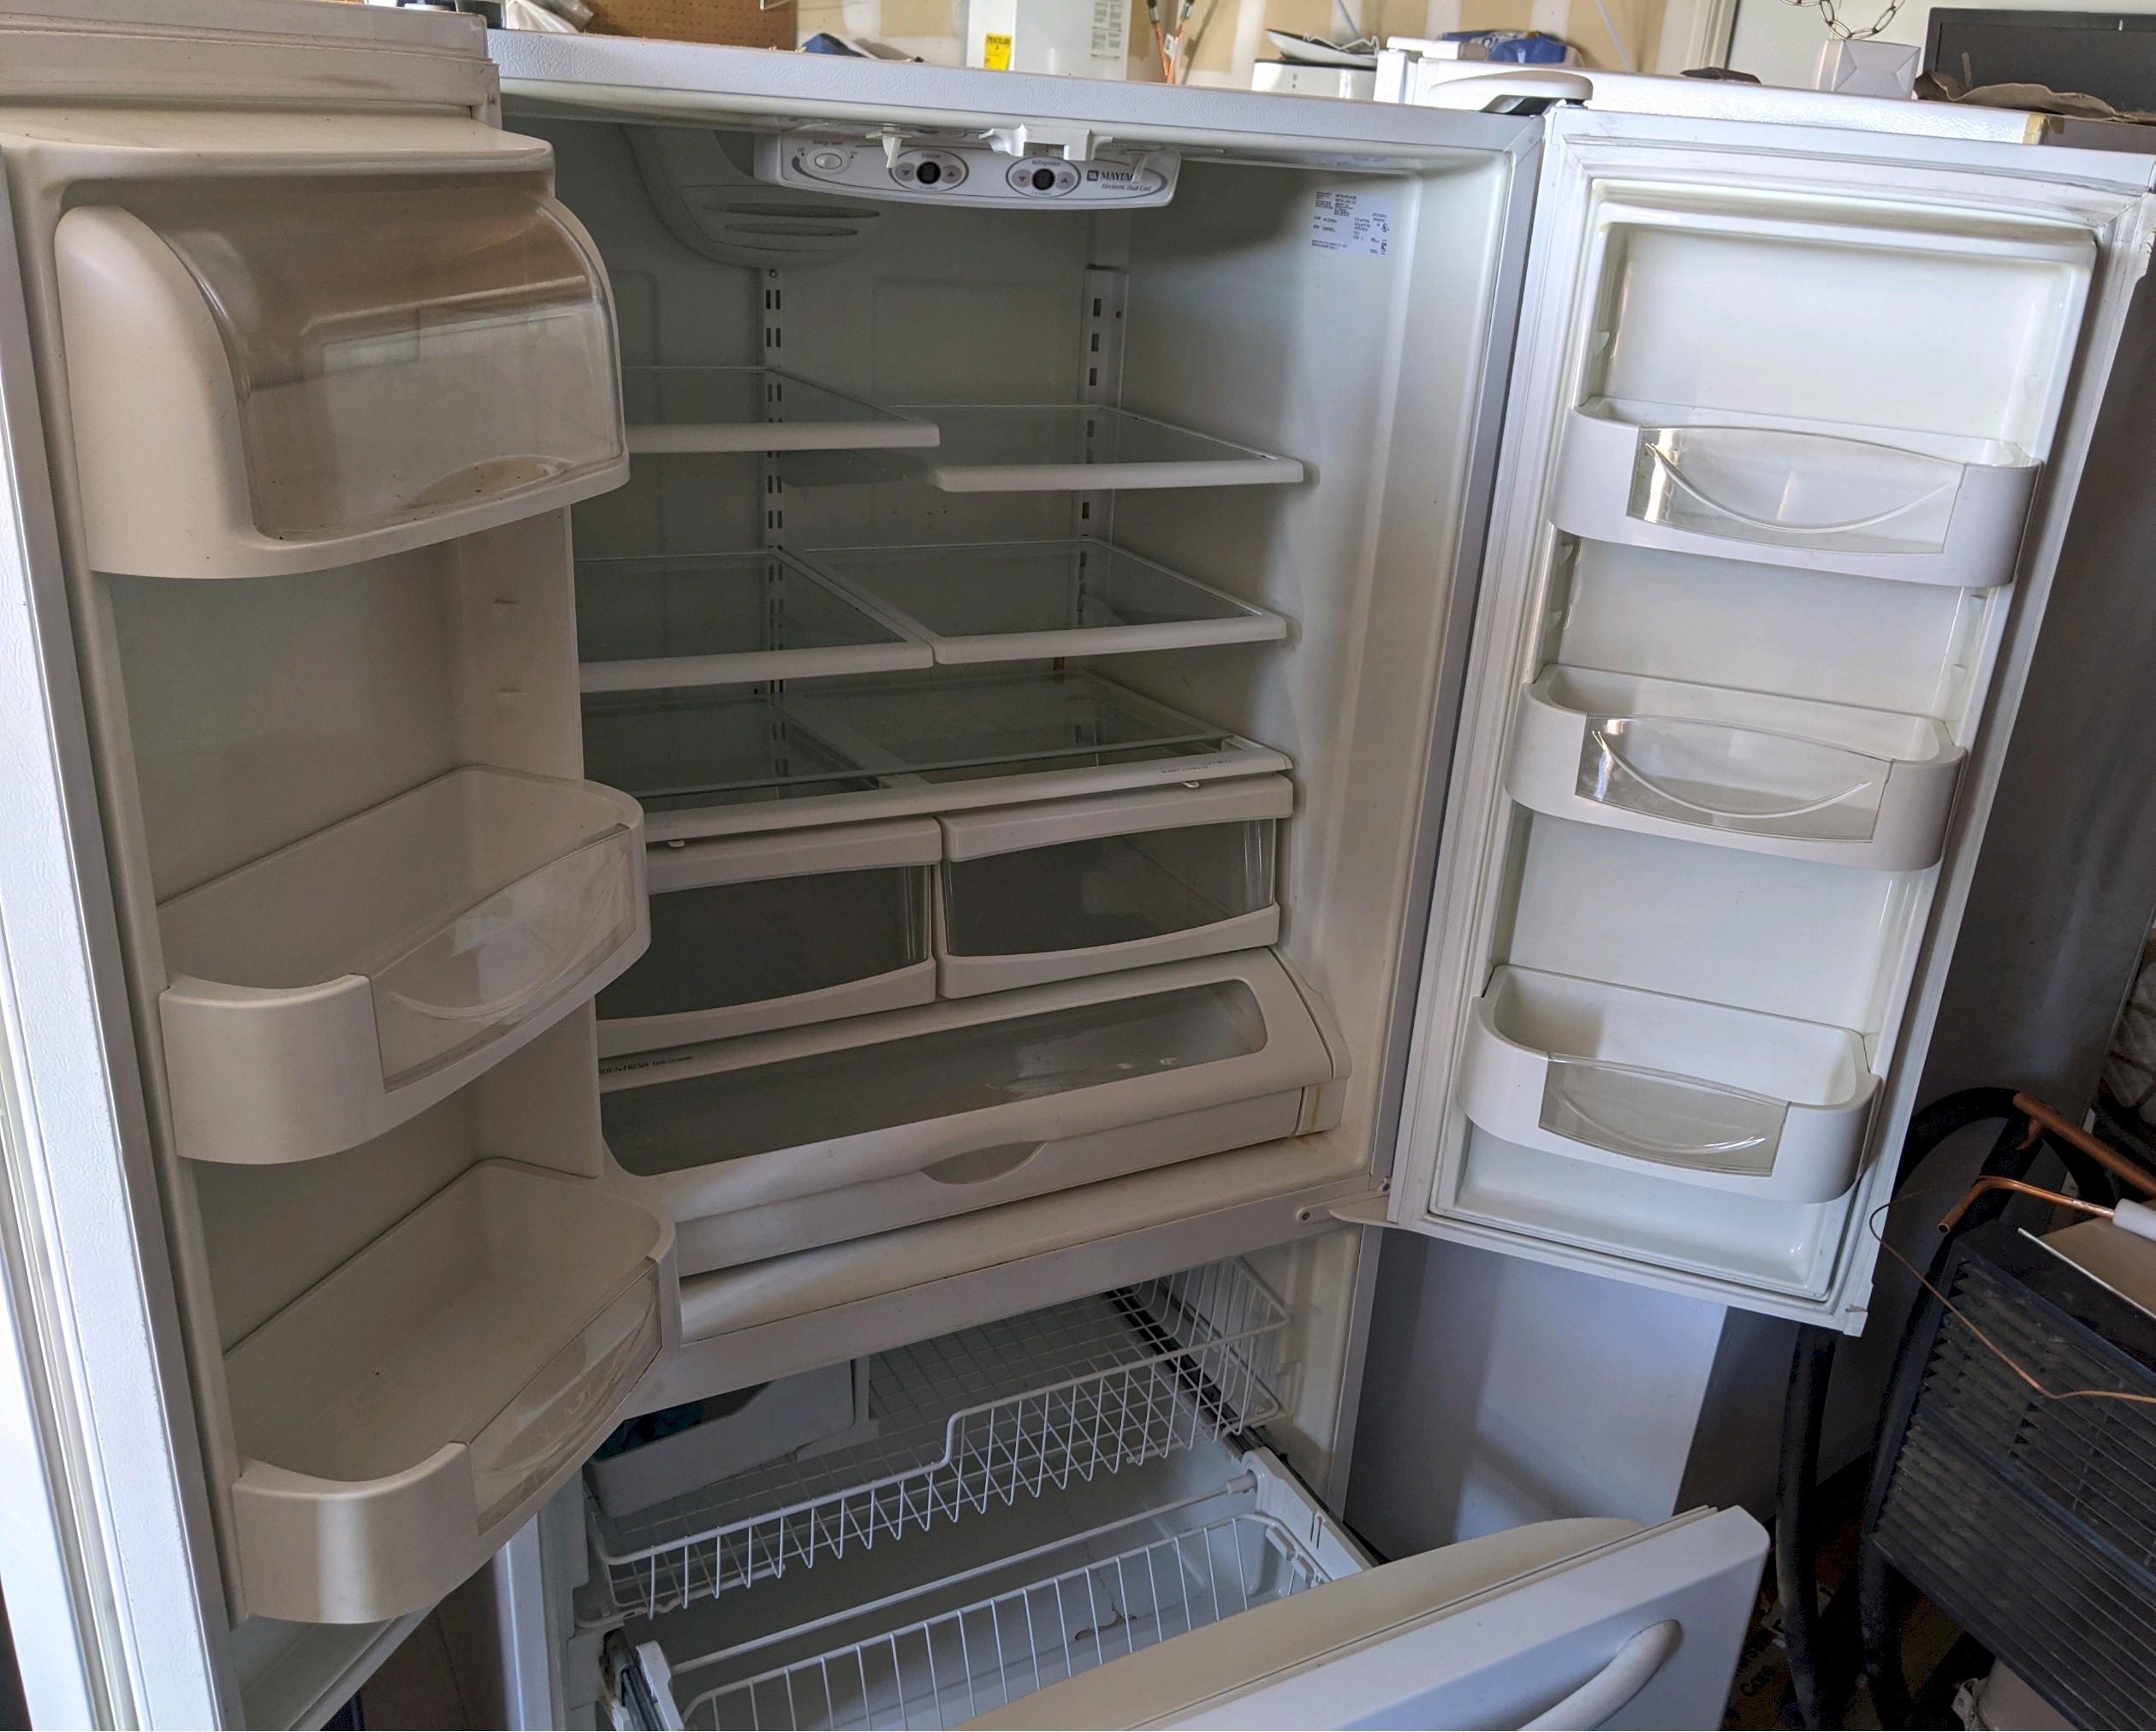 5 White French Door/Bottom Freezer